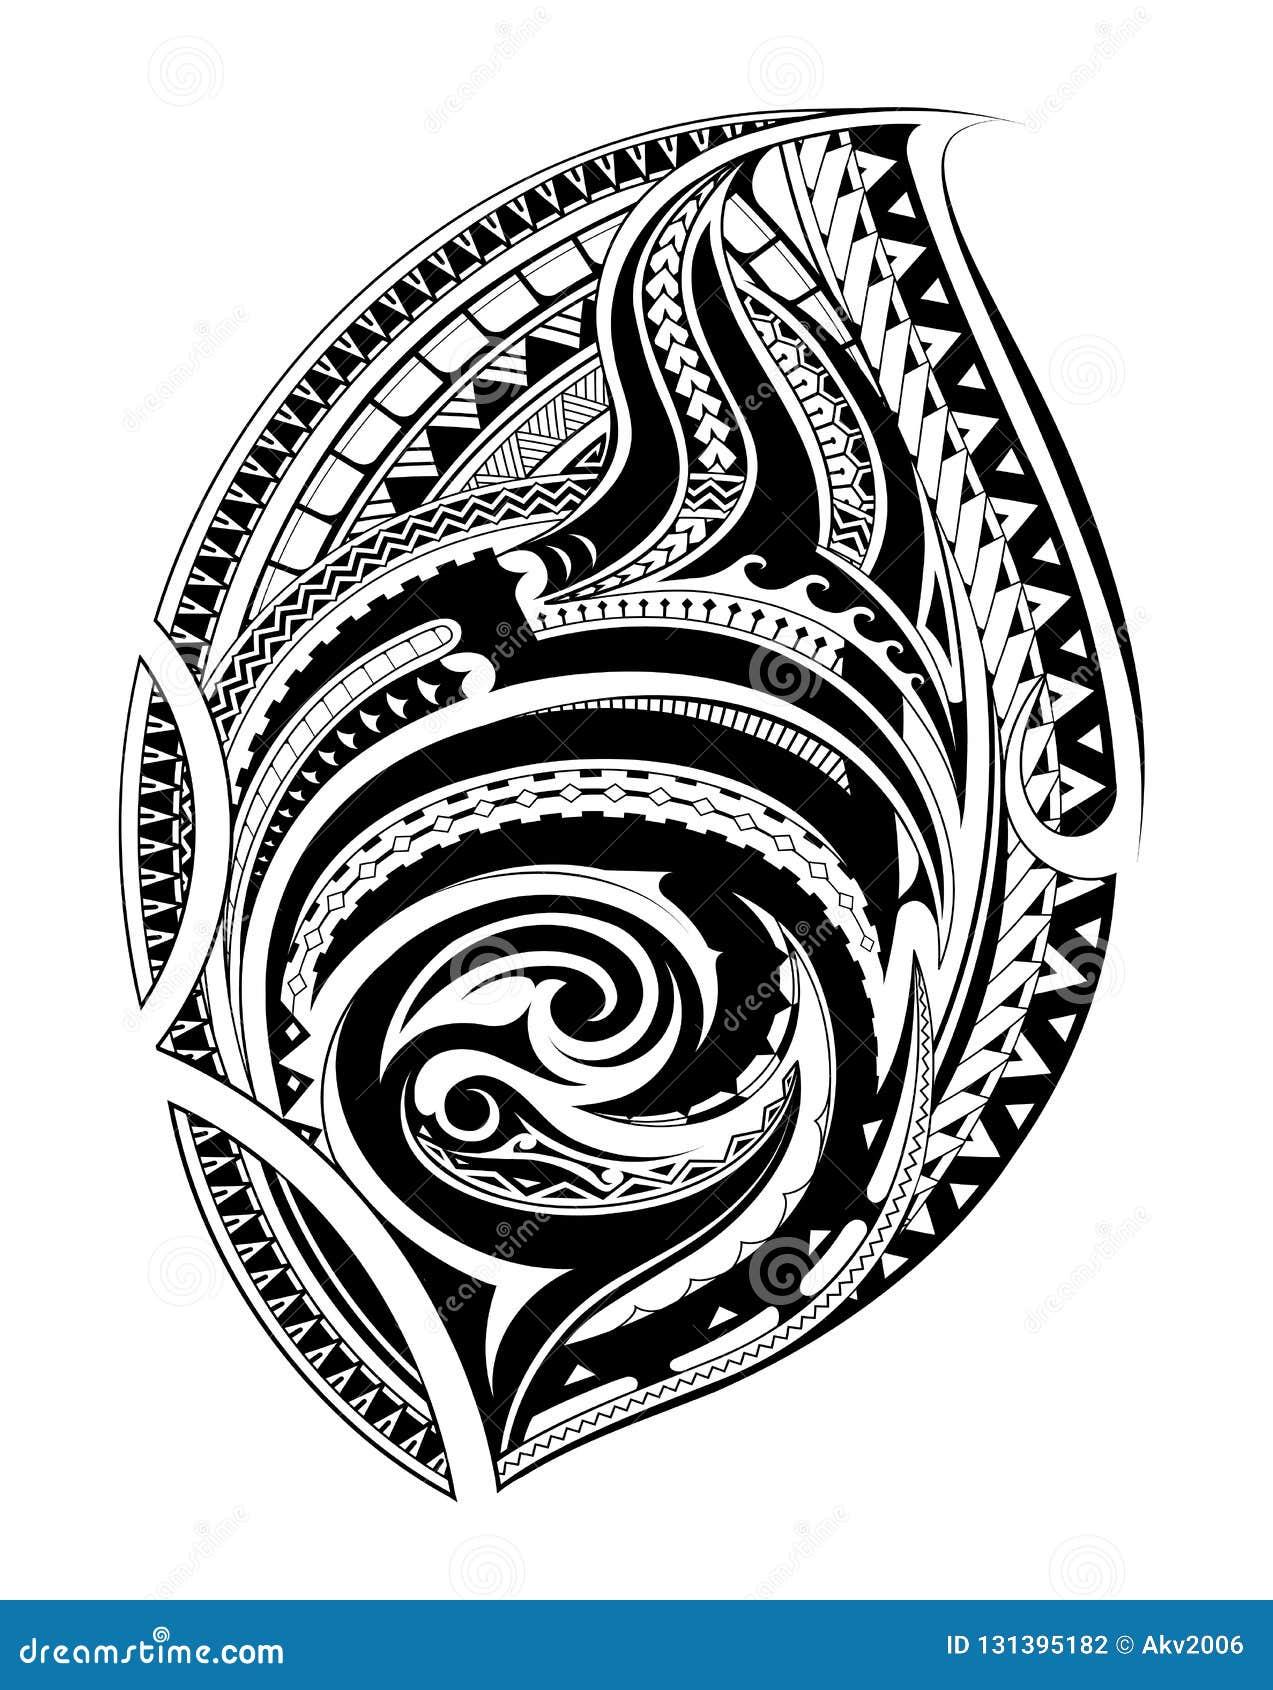 feb6210588f9c Polynesian ethnic style ornament. Good for chest or sleeve tattoo design